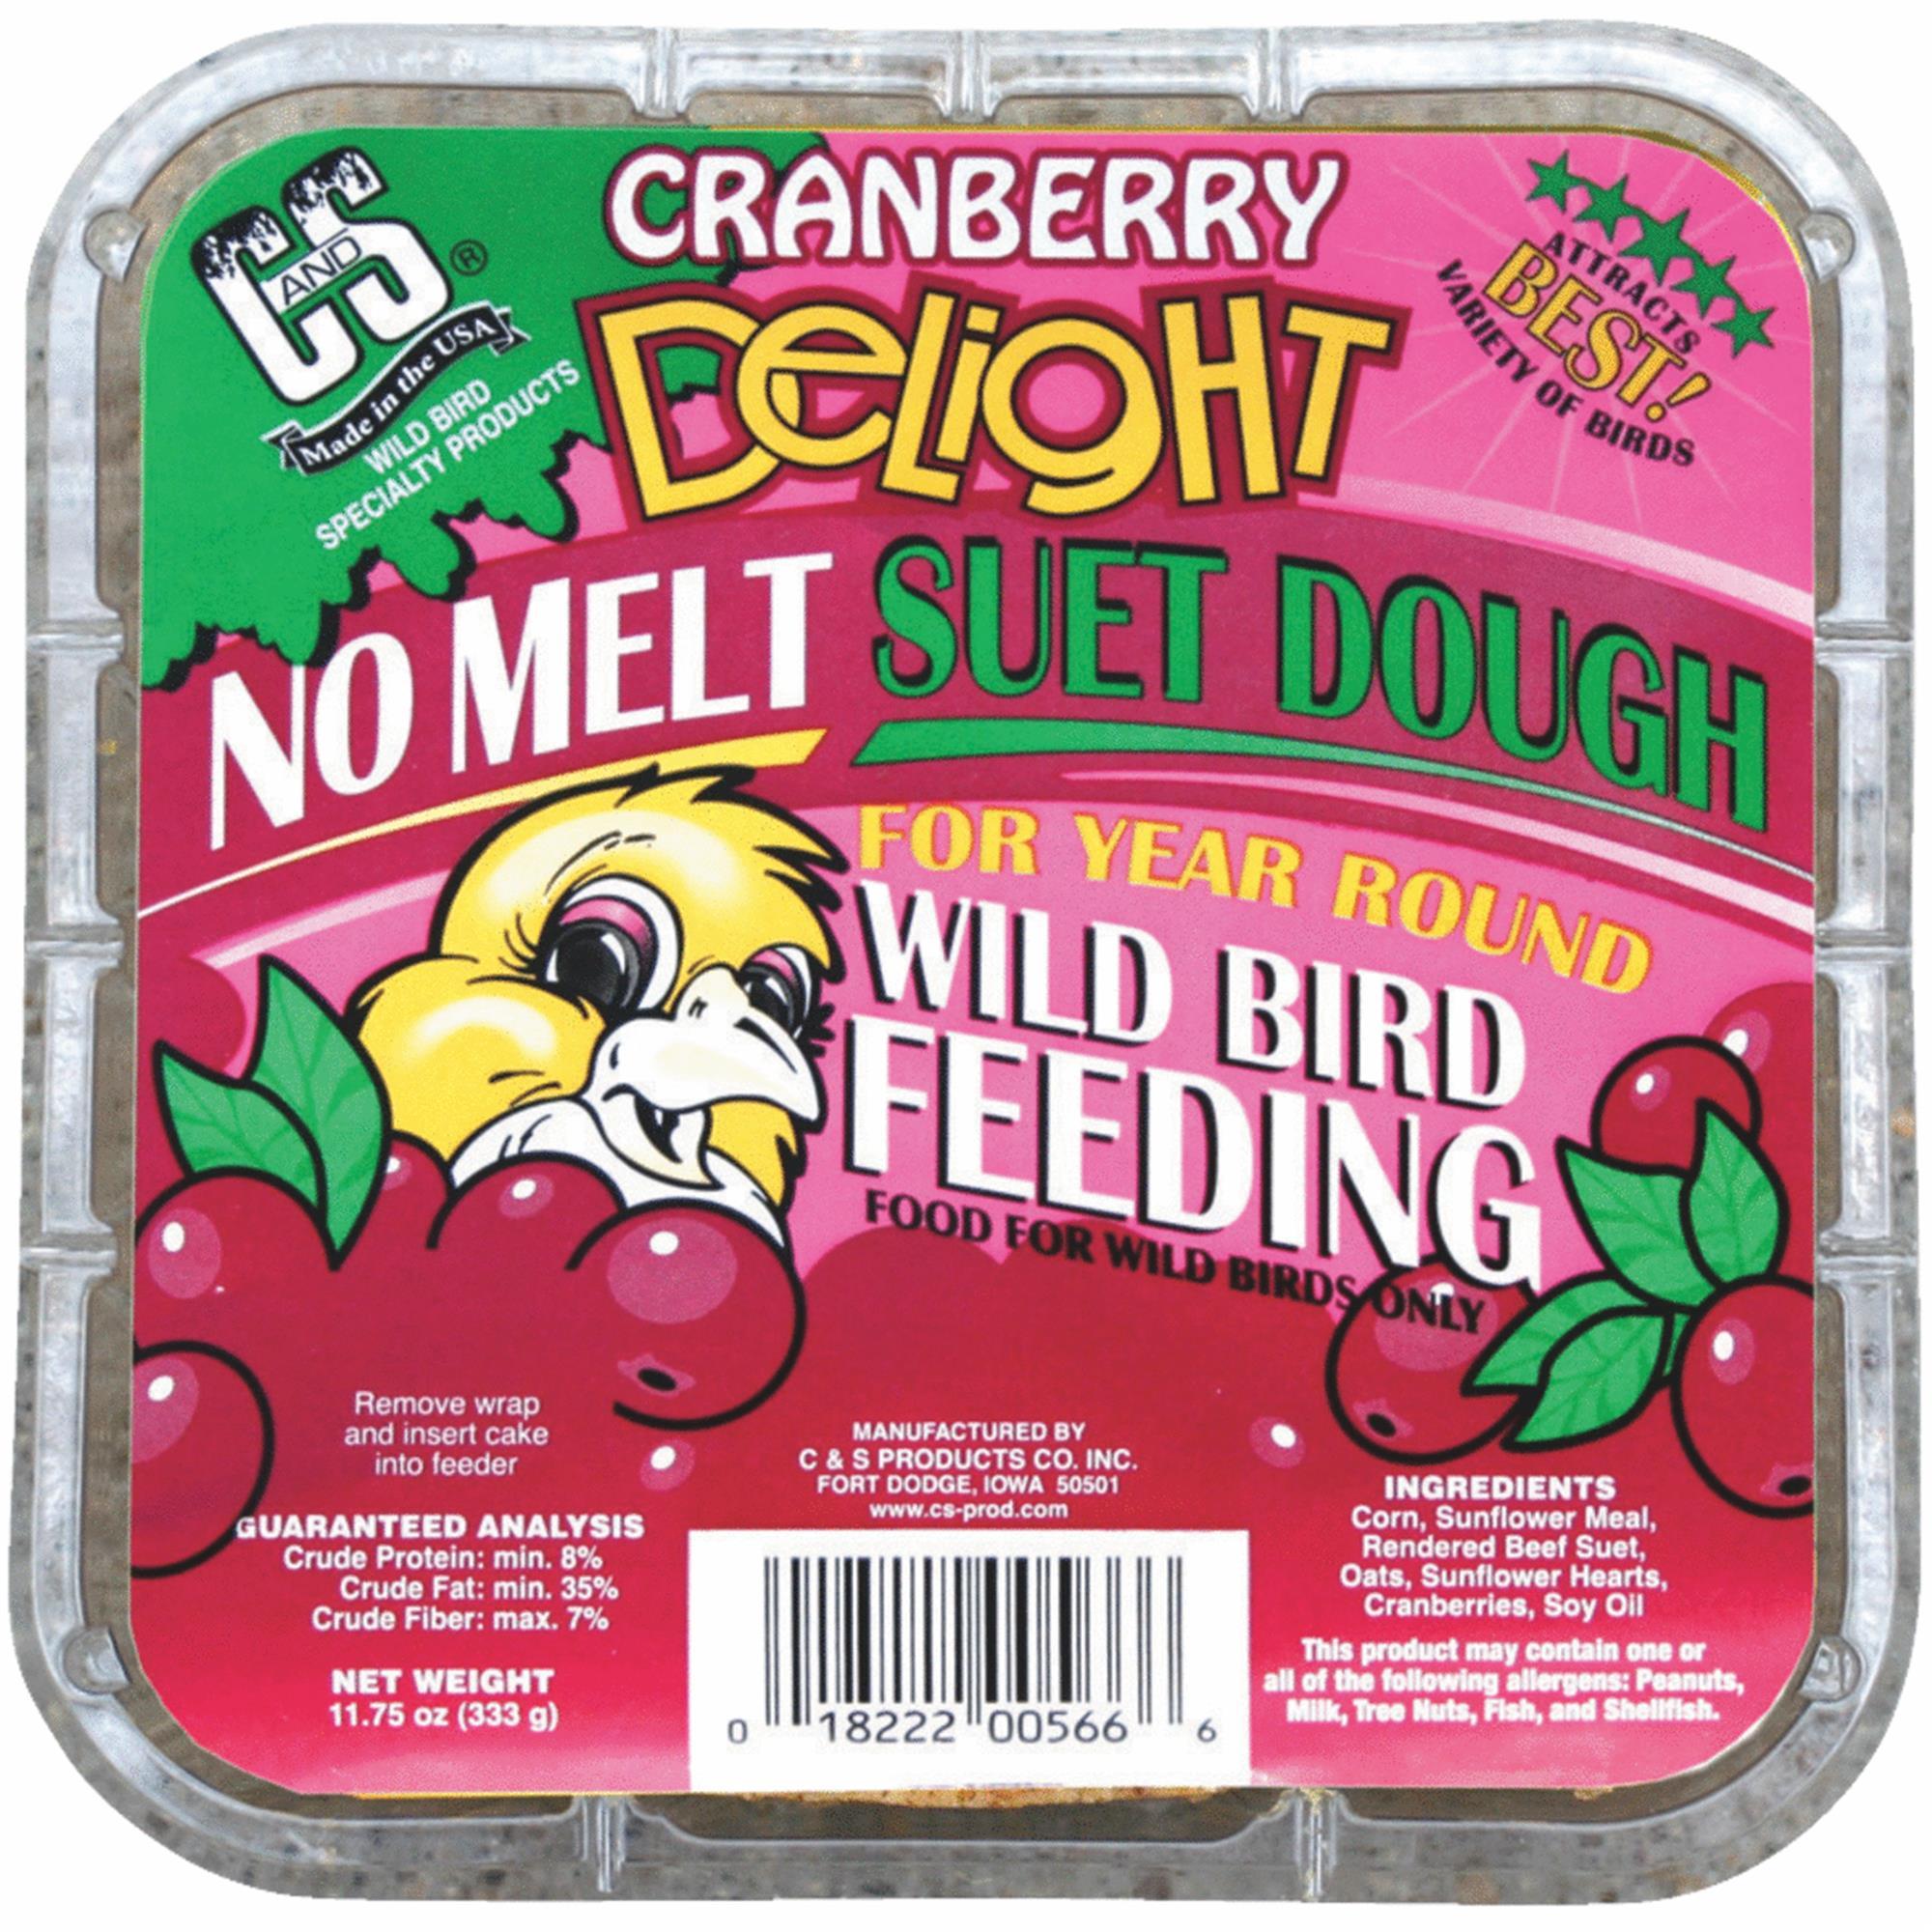 C & S PRODUCTS CO INC Wild Bird Suet Dough Cake, Cranberry Delight, 11.75-oz by C. & S. Prod.